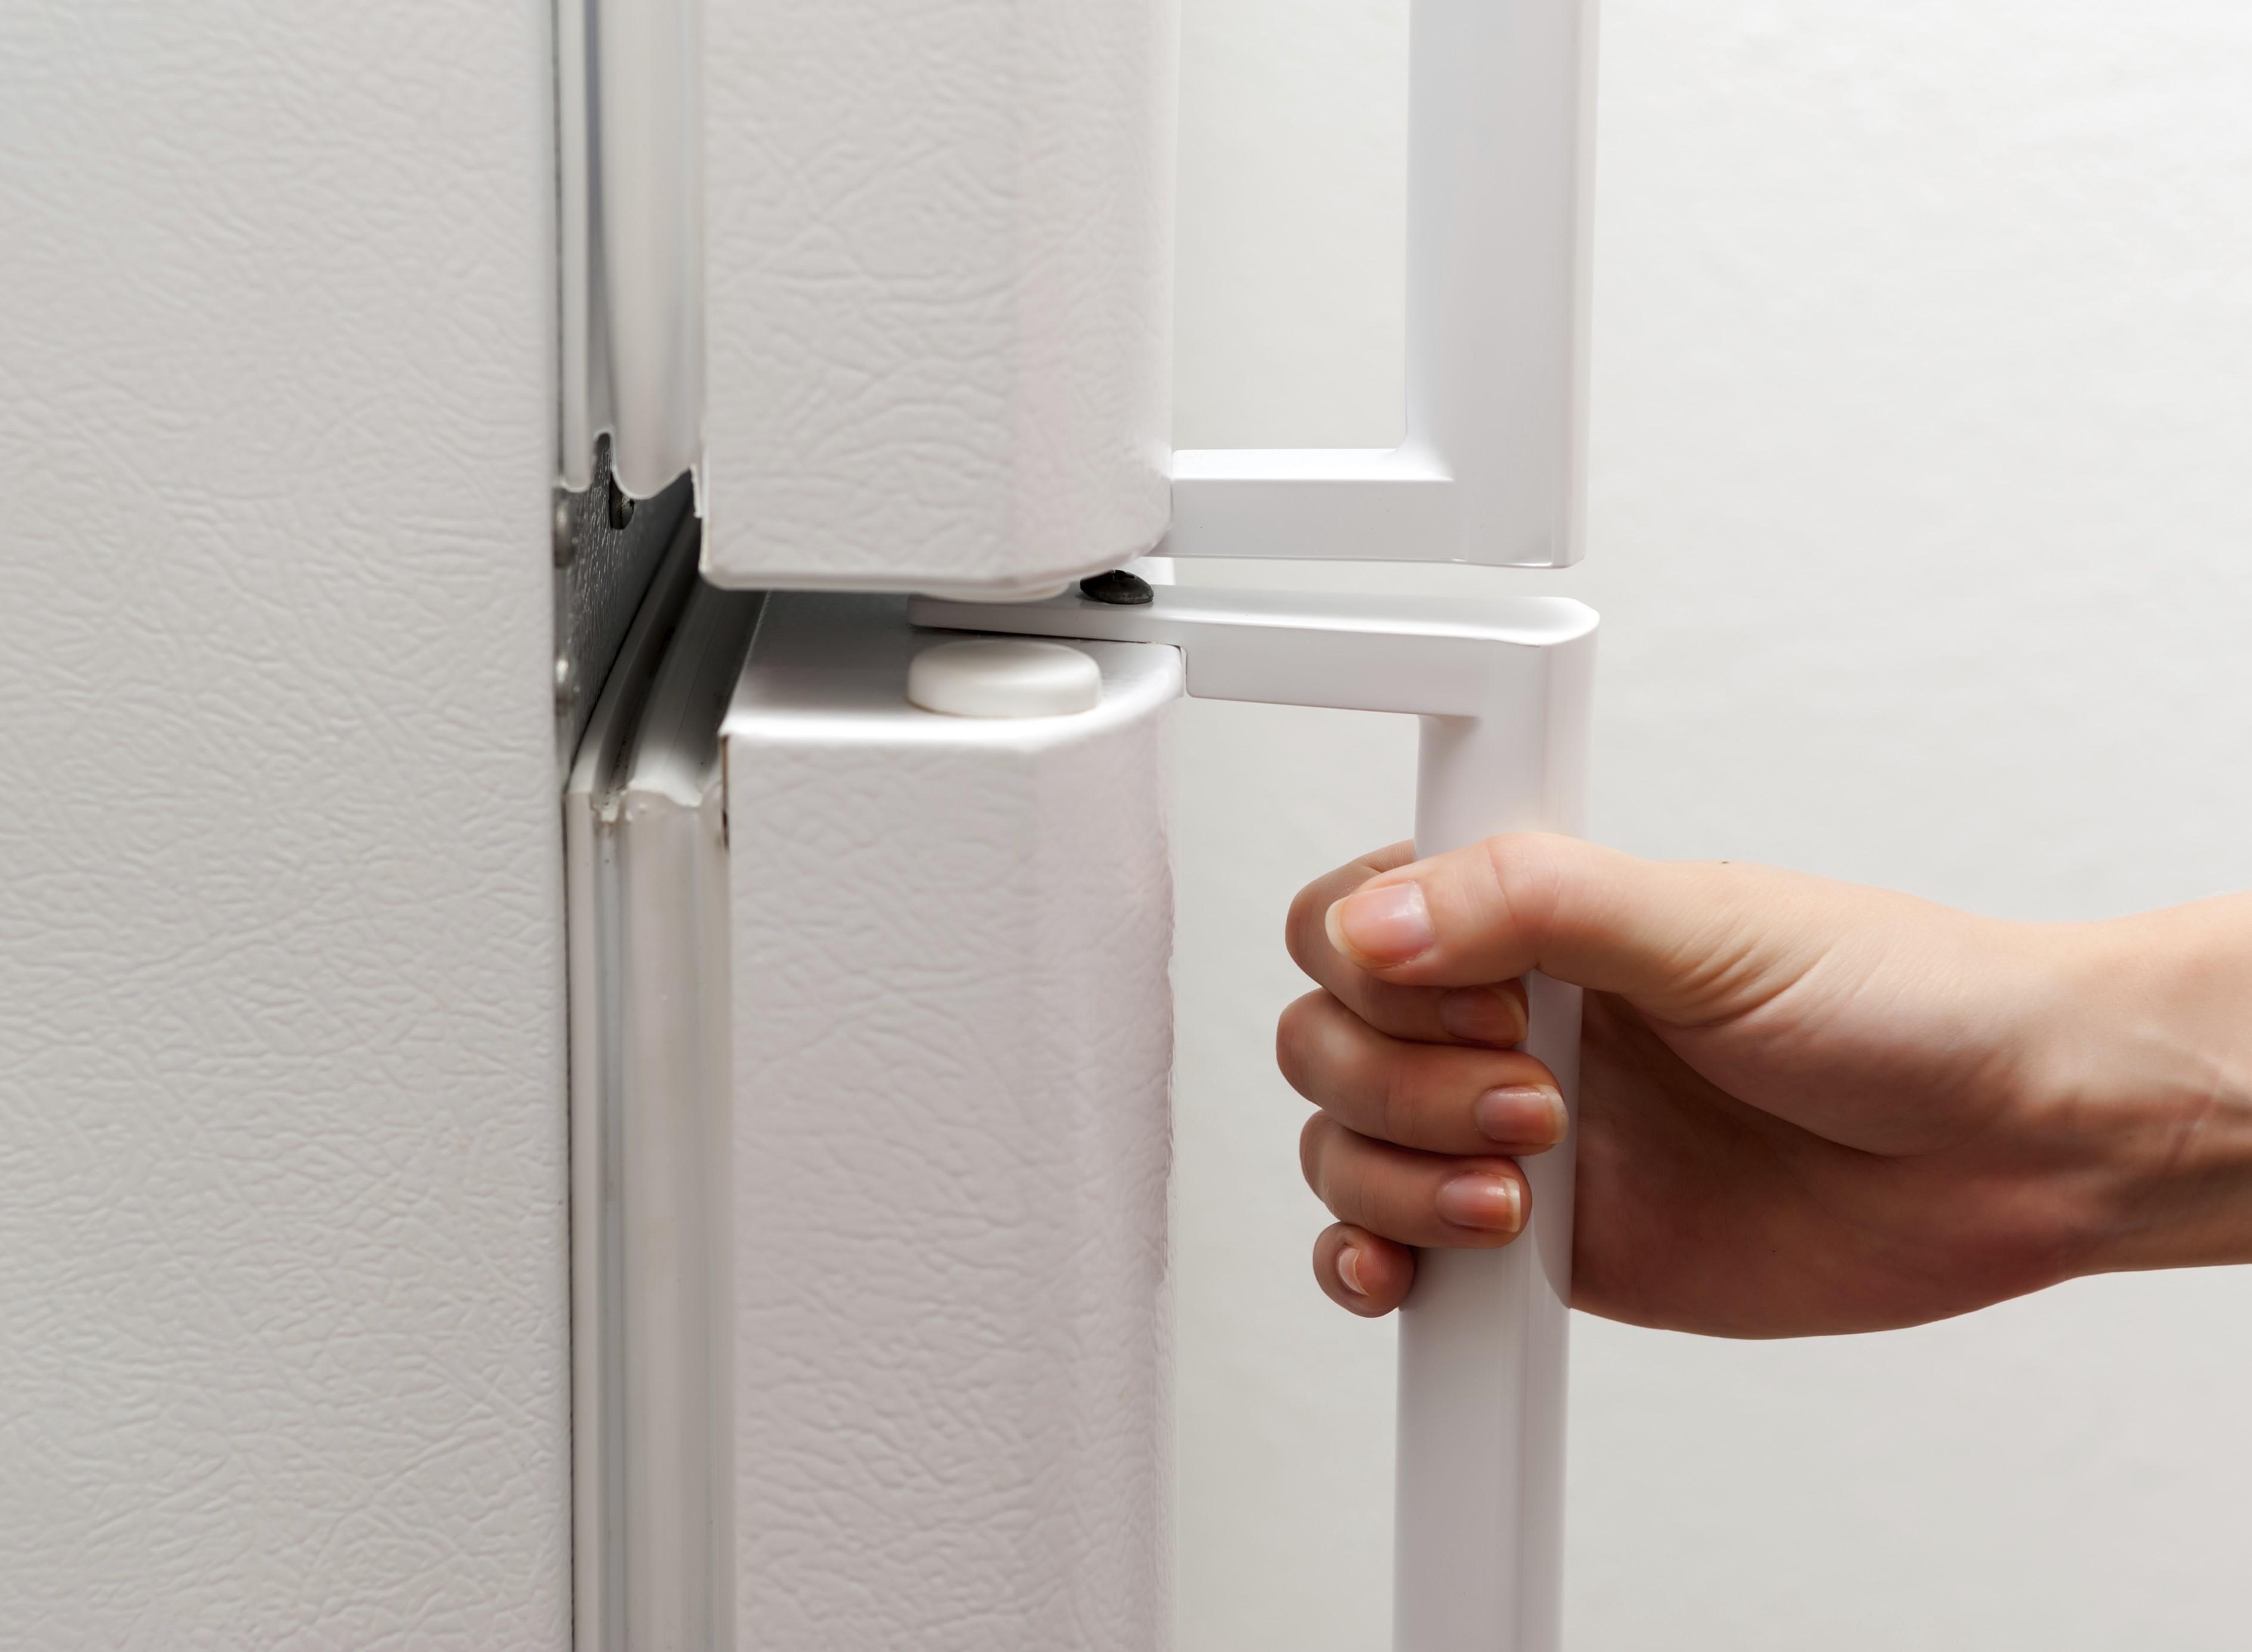 How To Keep The Refrigerator Door Closed Speedy